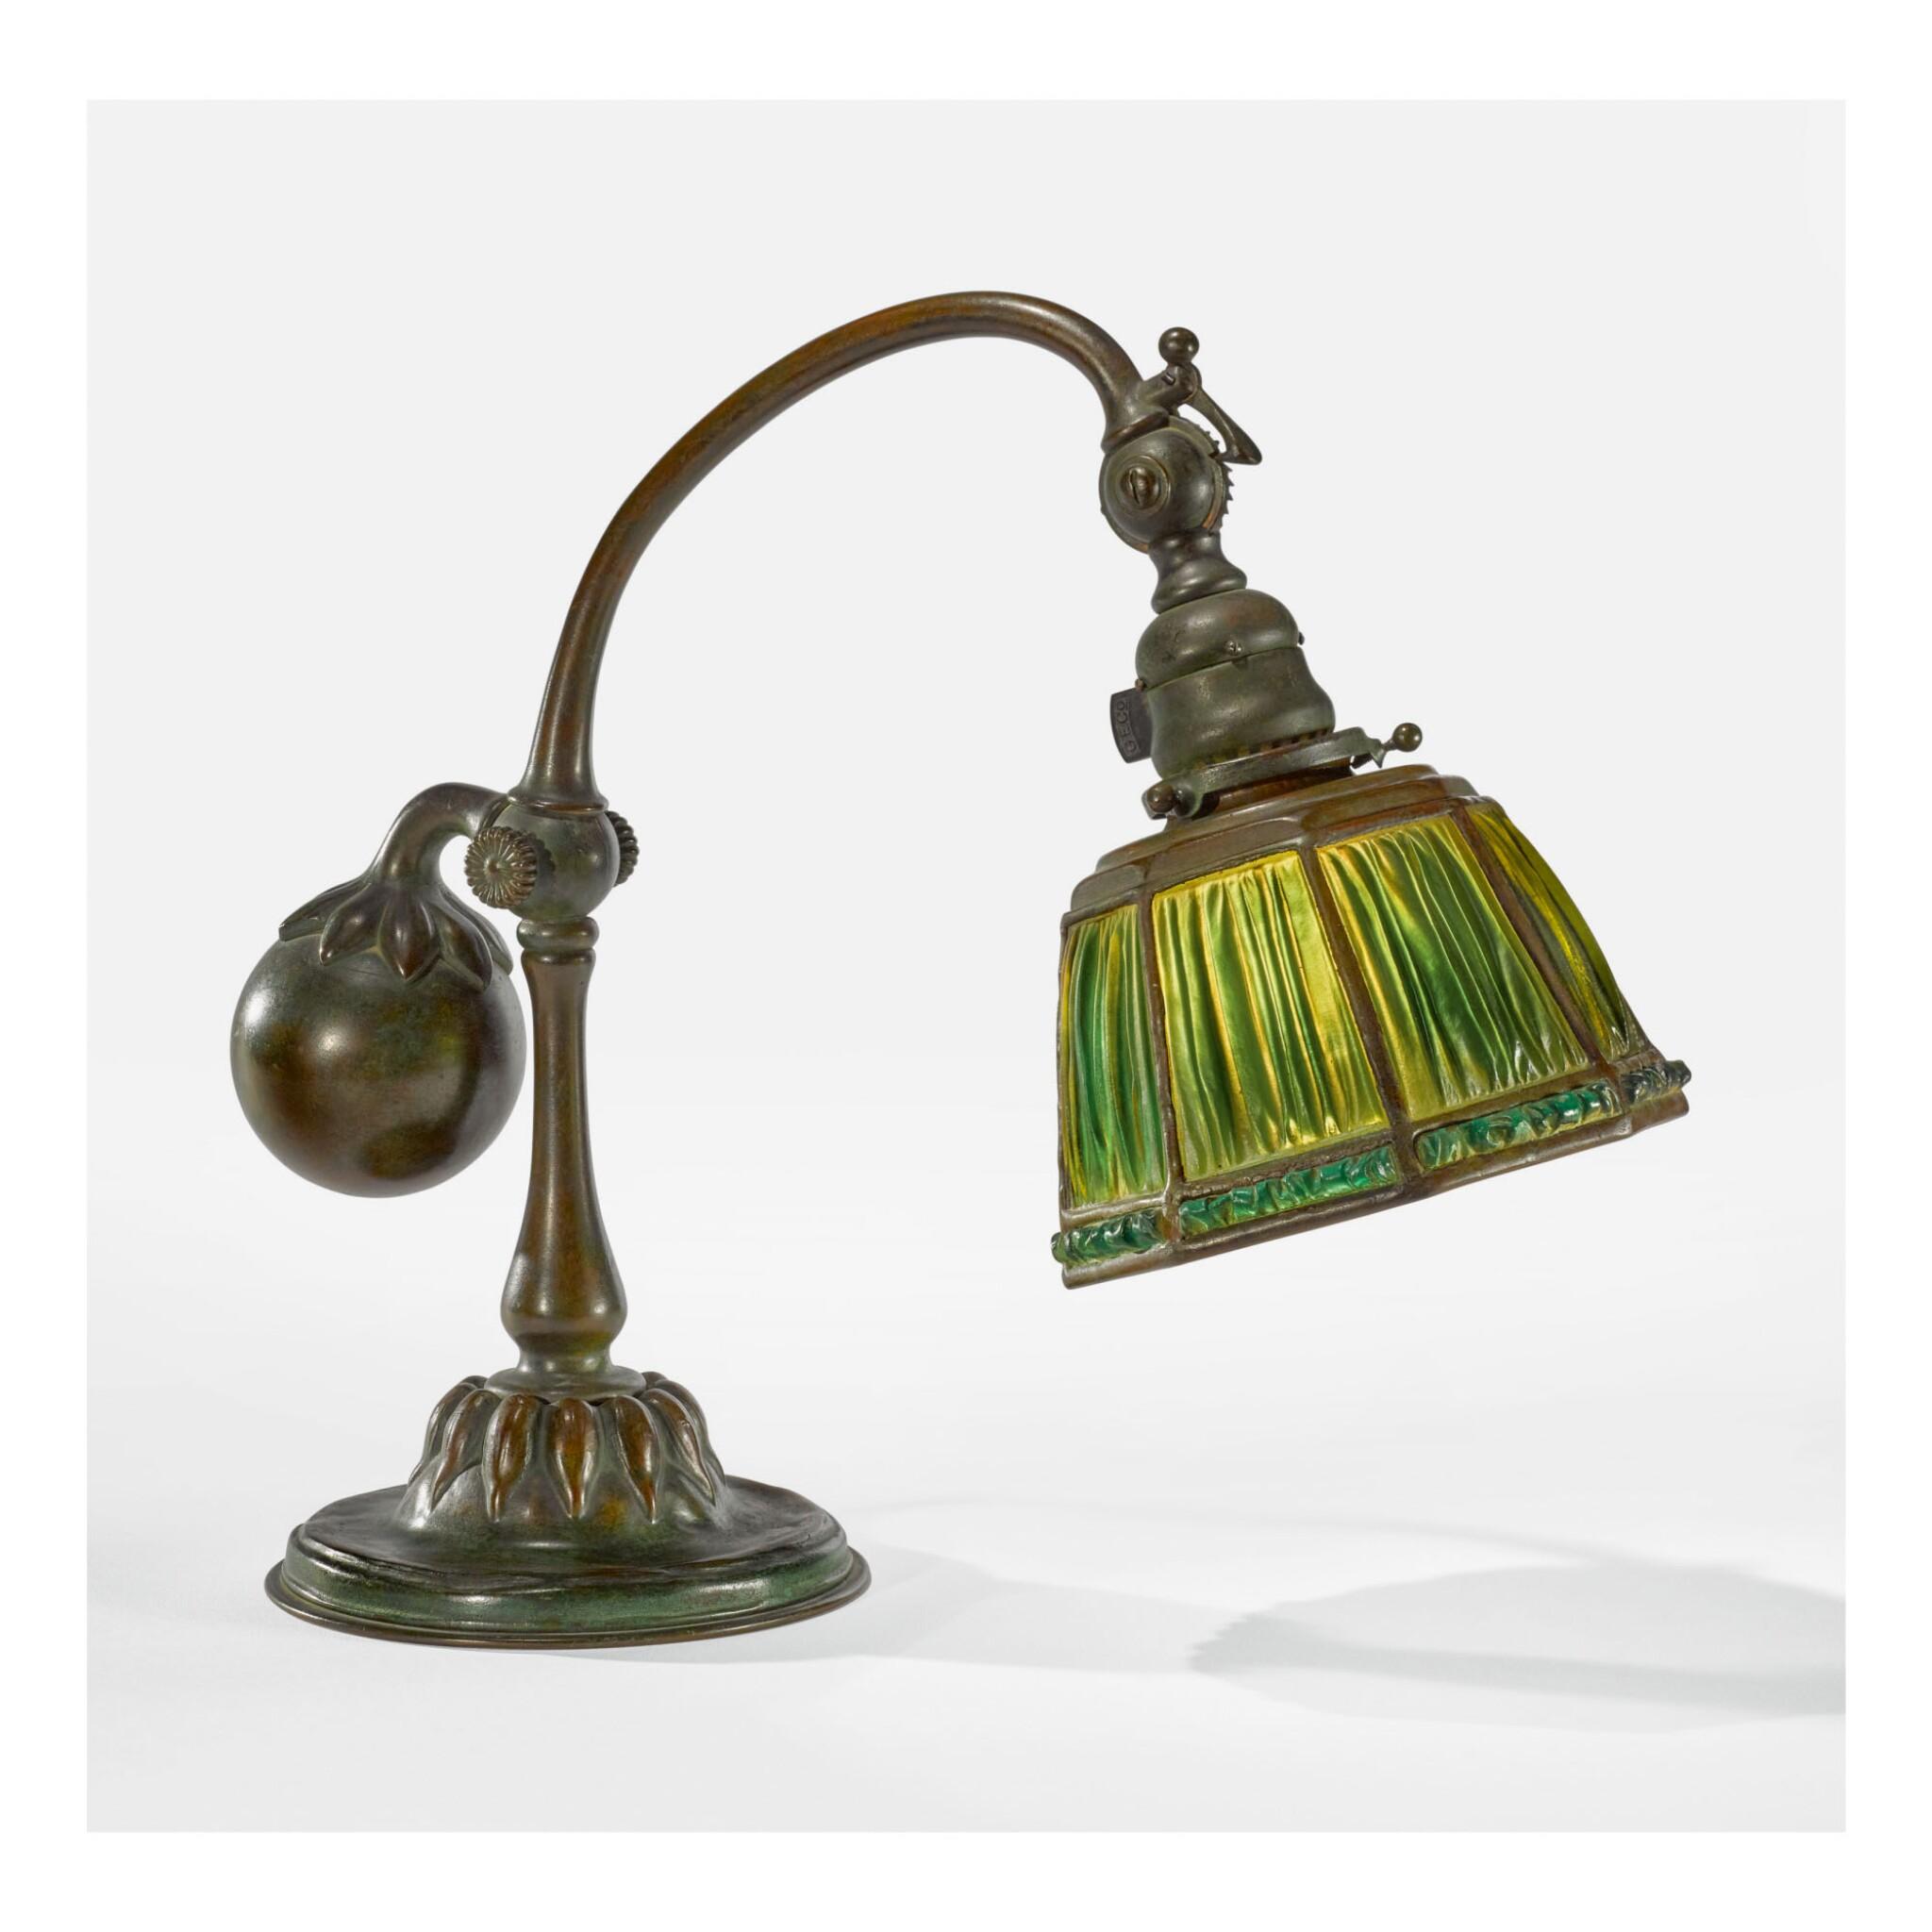 "TIFFANY STUDIOS | ""FAVRILE FABRIQUE"" COUNTER-BALANCE DESK LAMP"